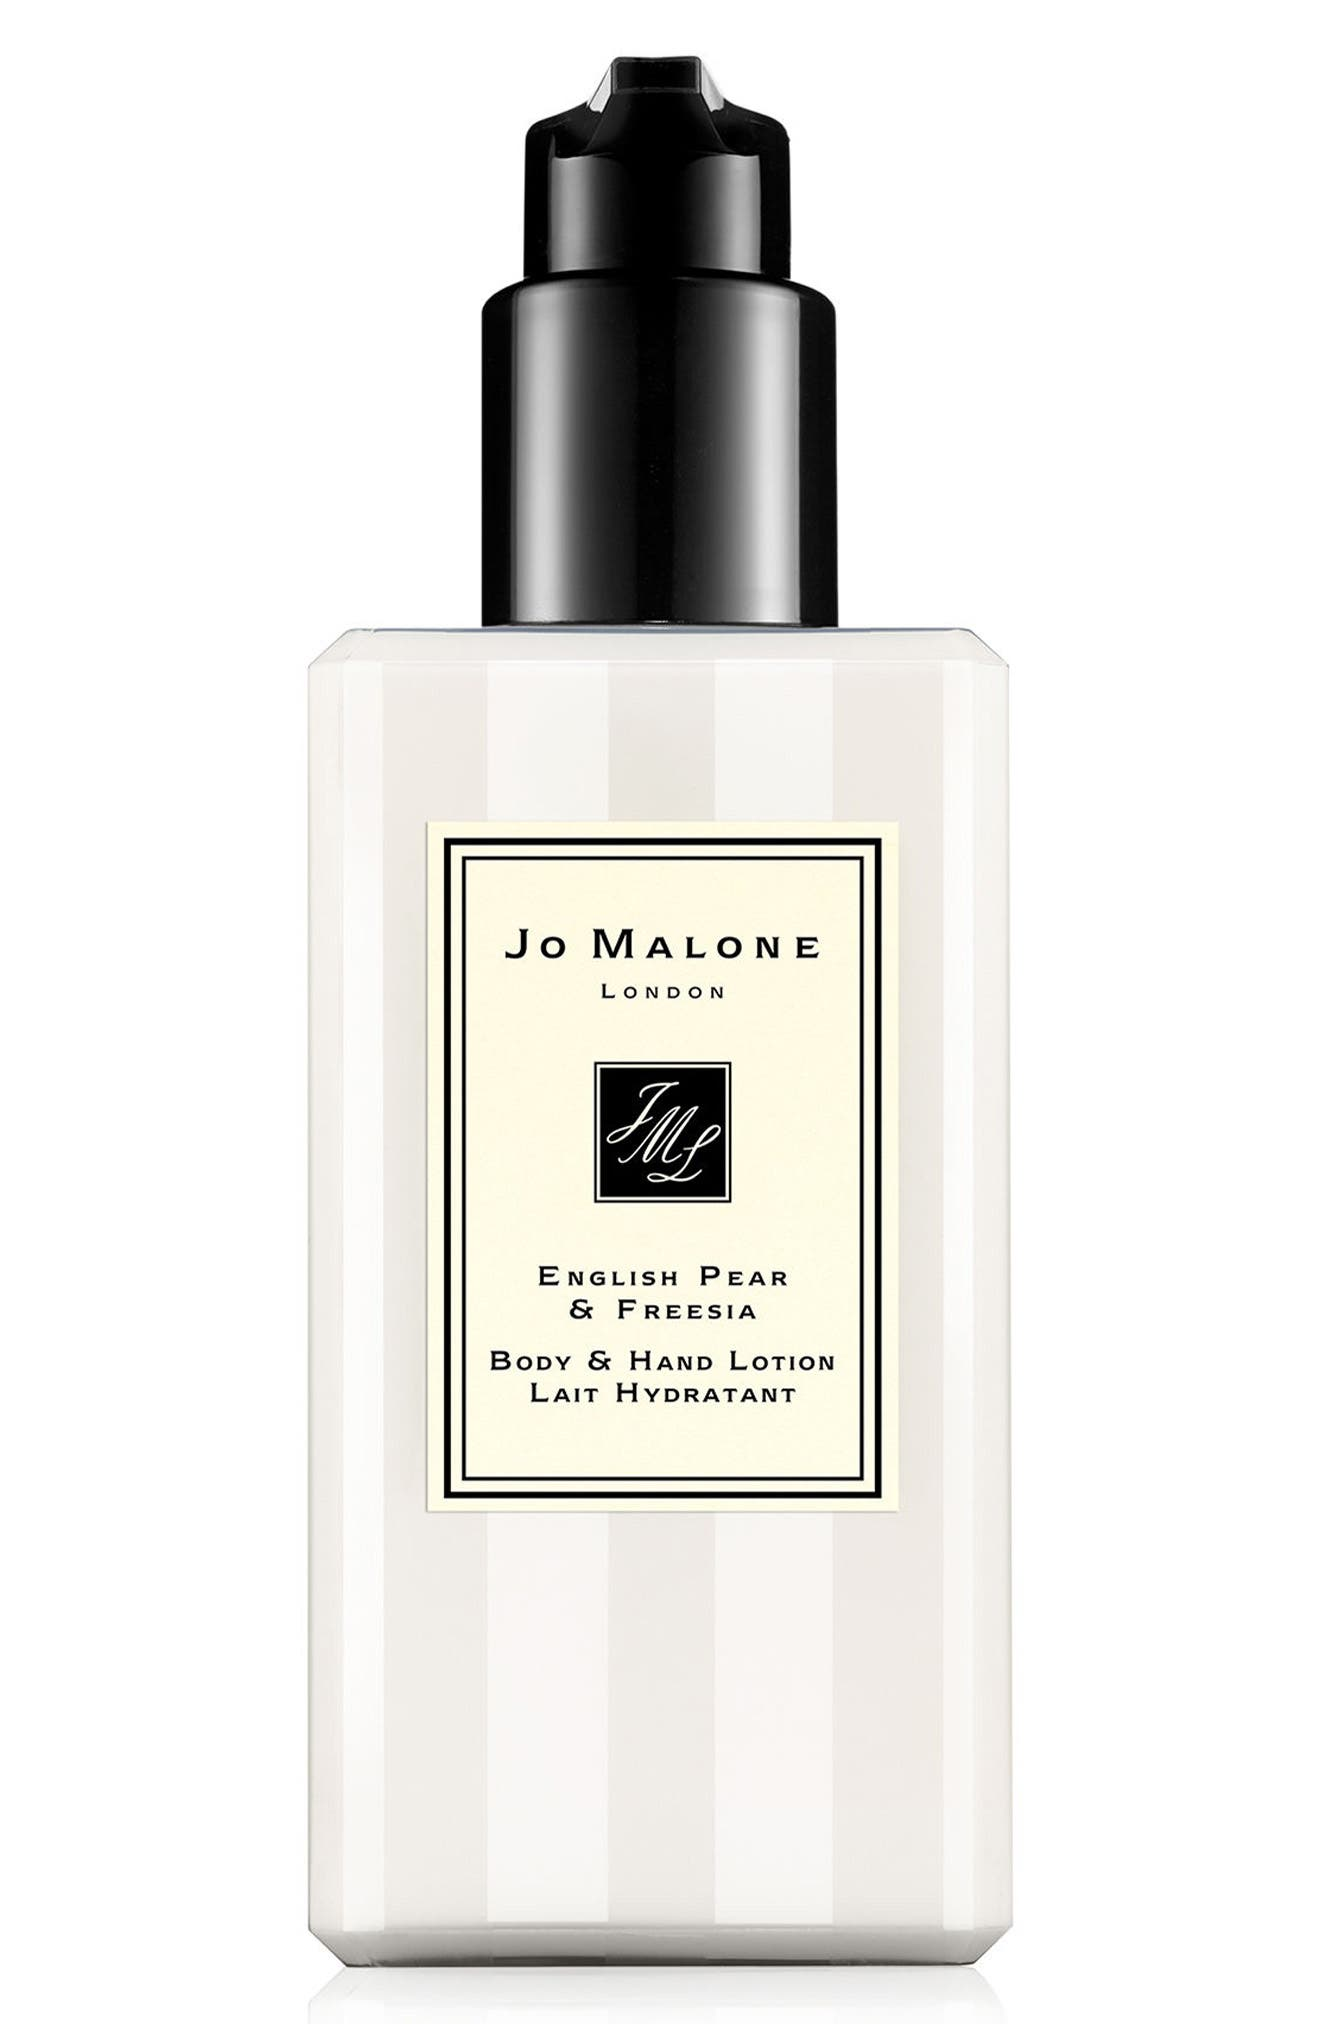 Jo Malone London™ 'English Pear & Freesia' Body & Hand Lotion